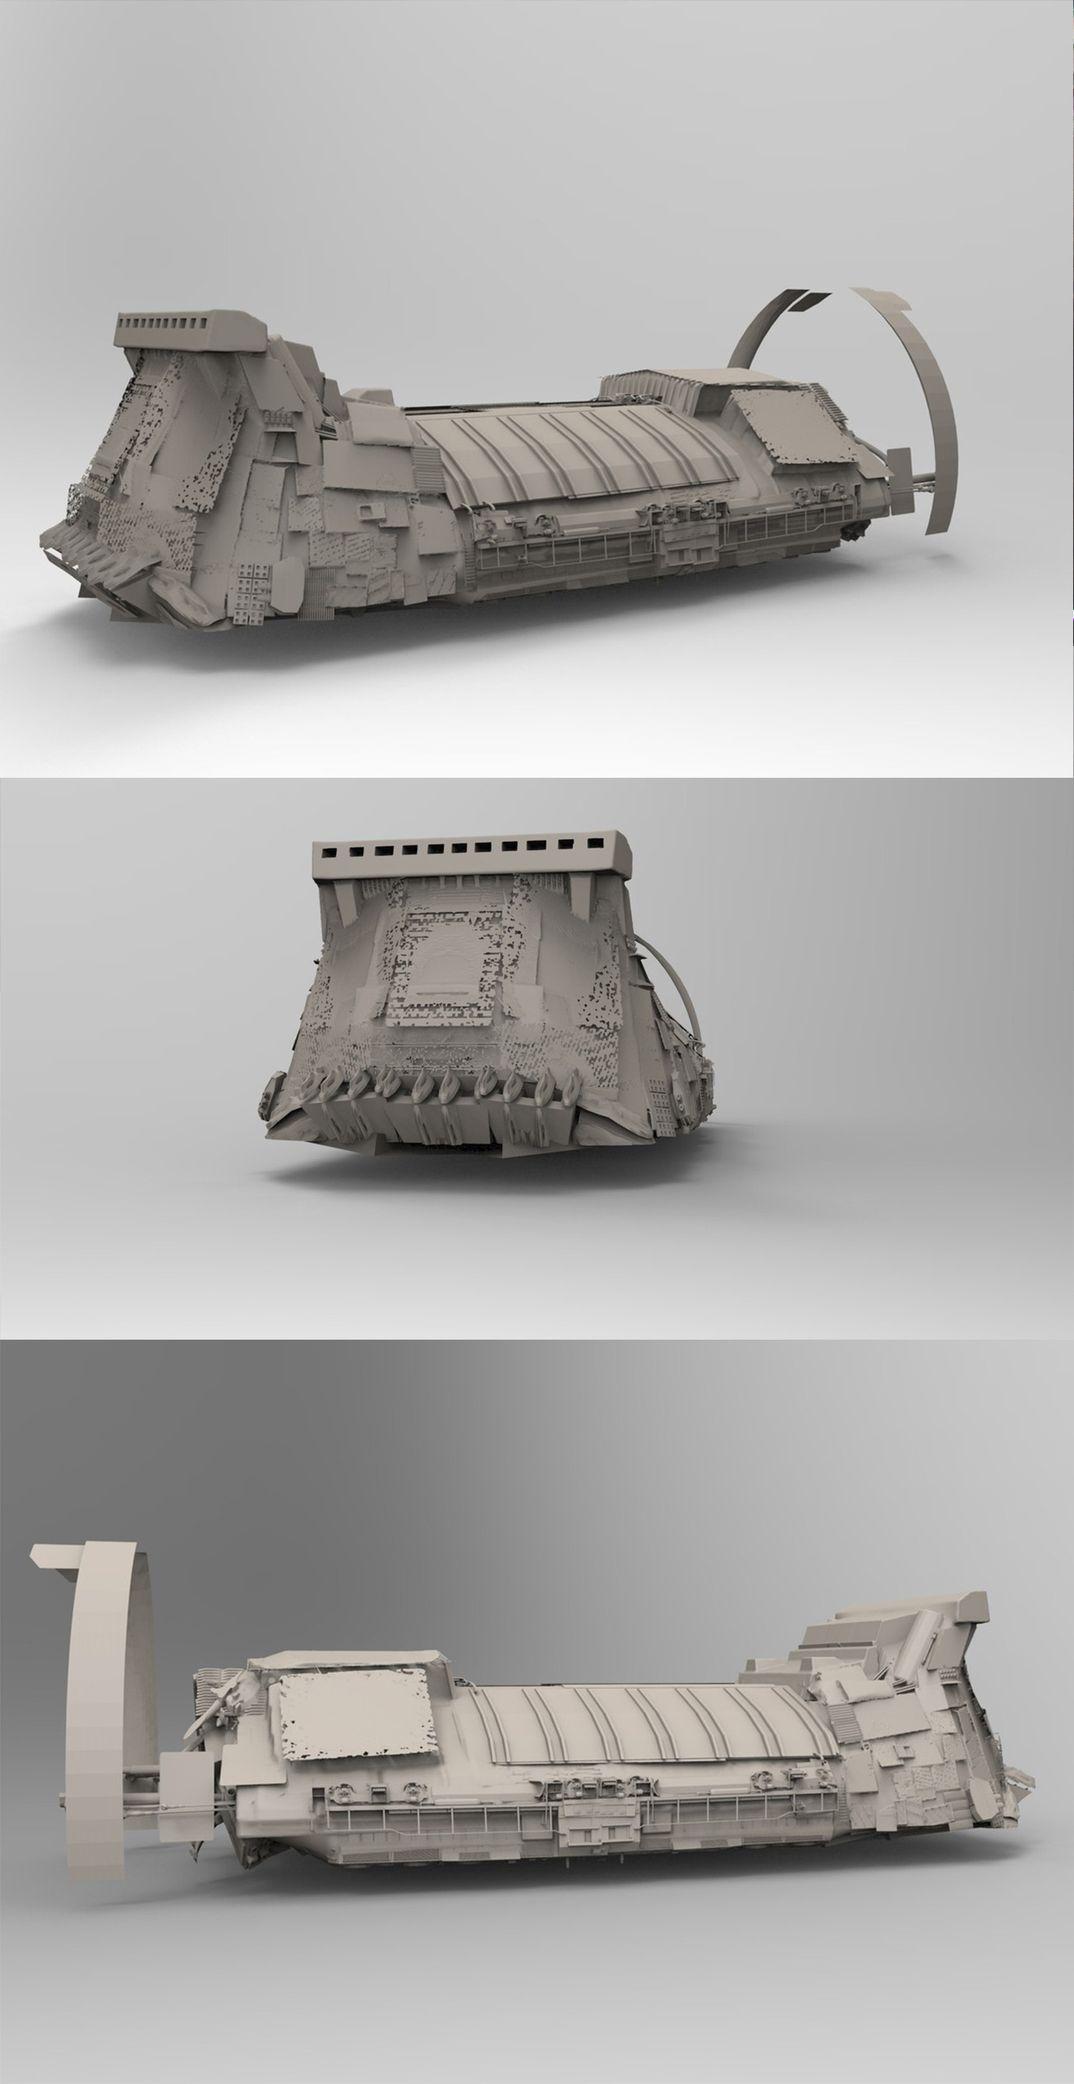 Tatooine's cargo ship